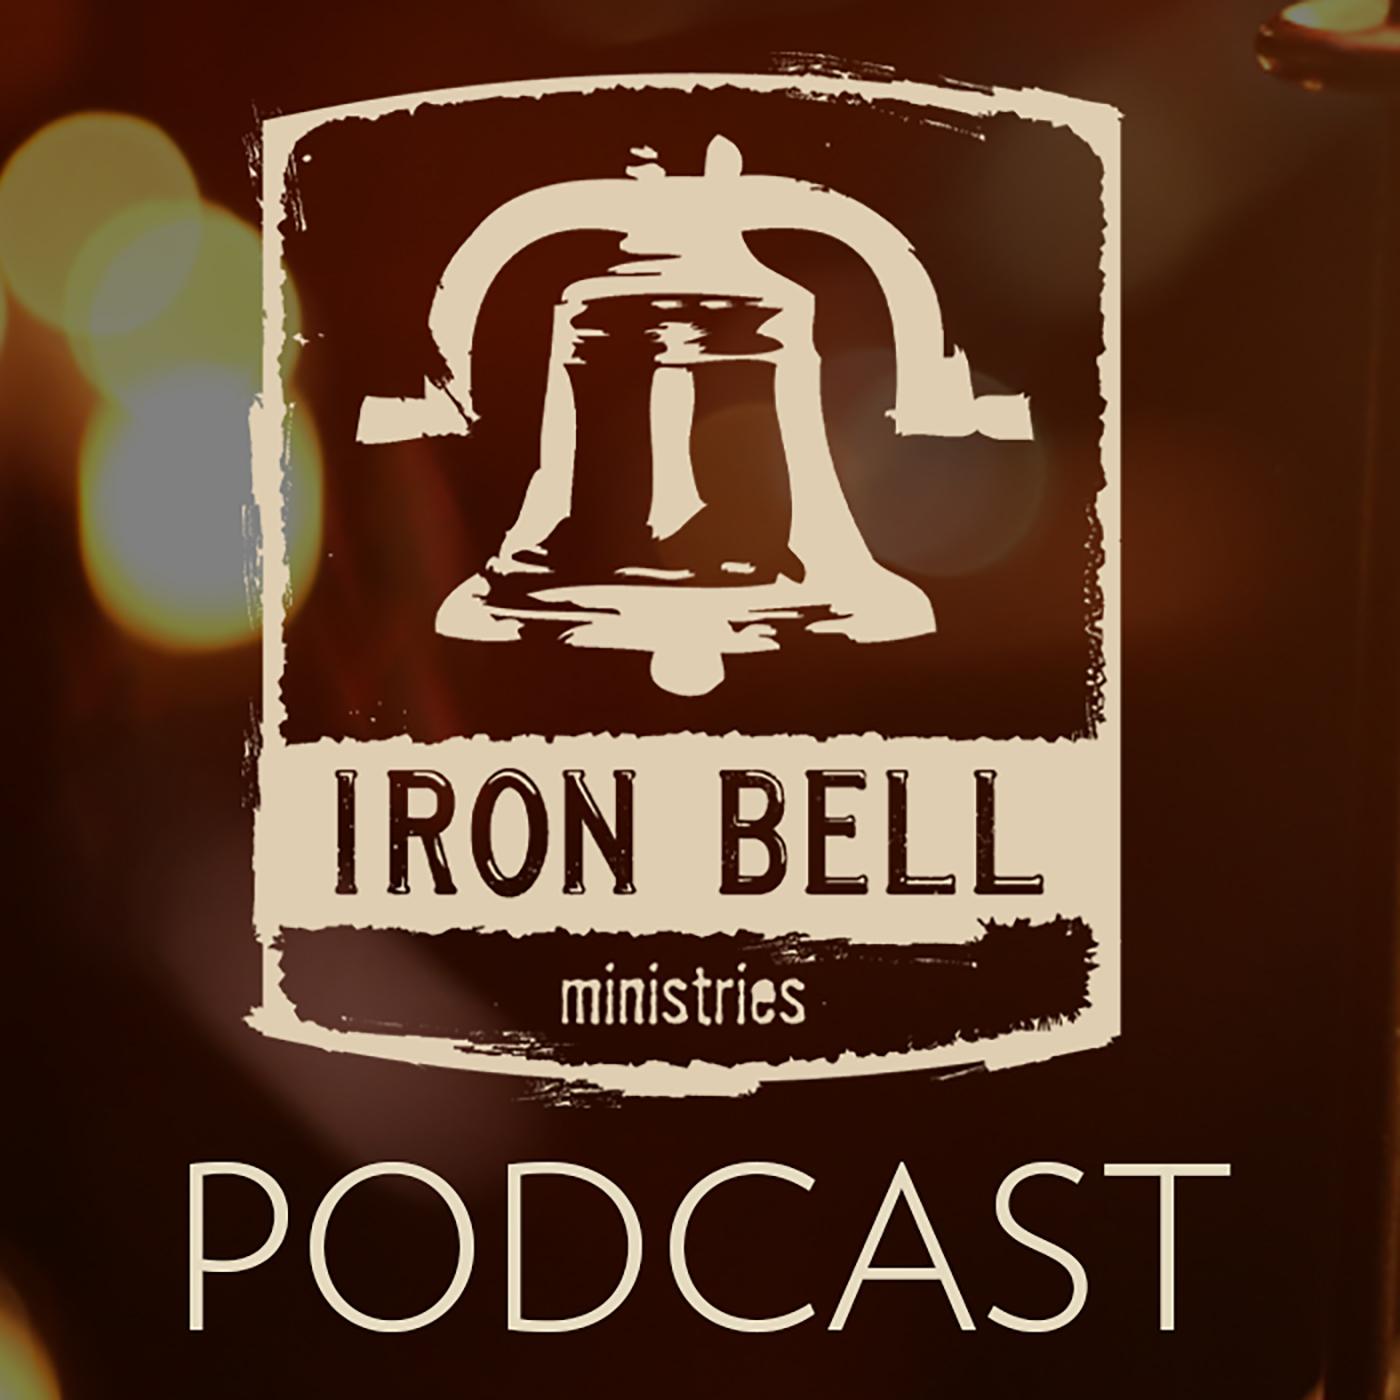 Podcast - ironbellministries